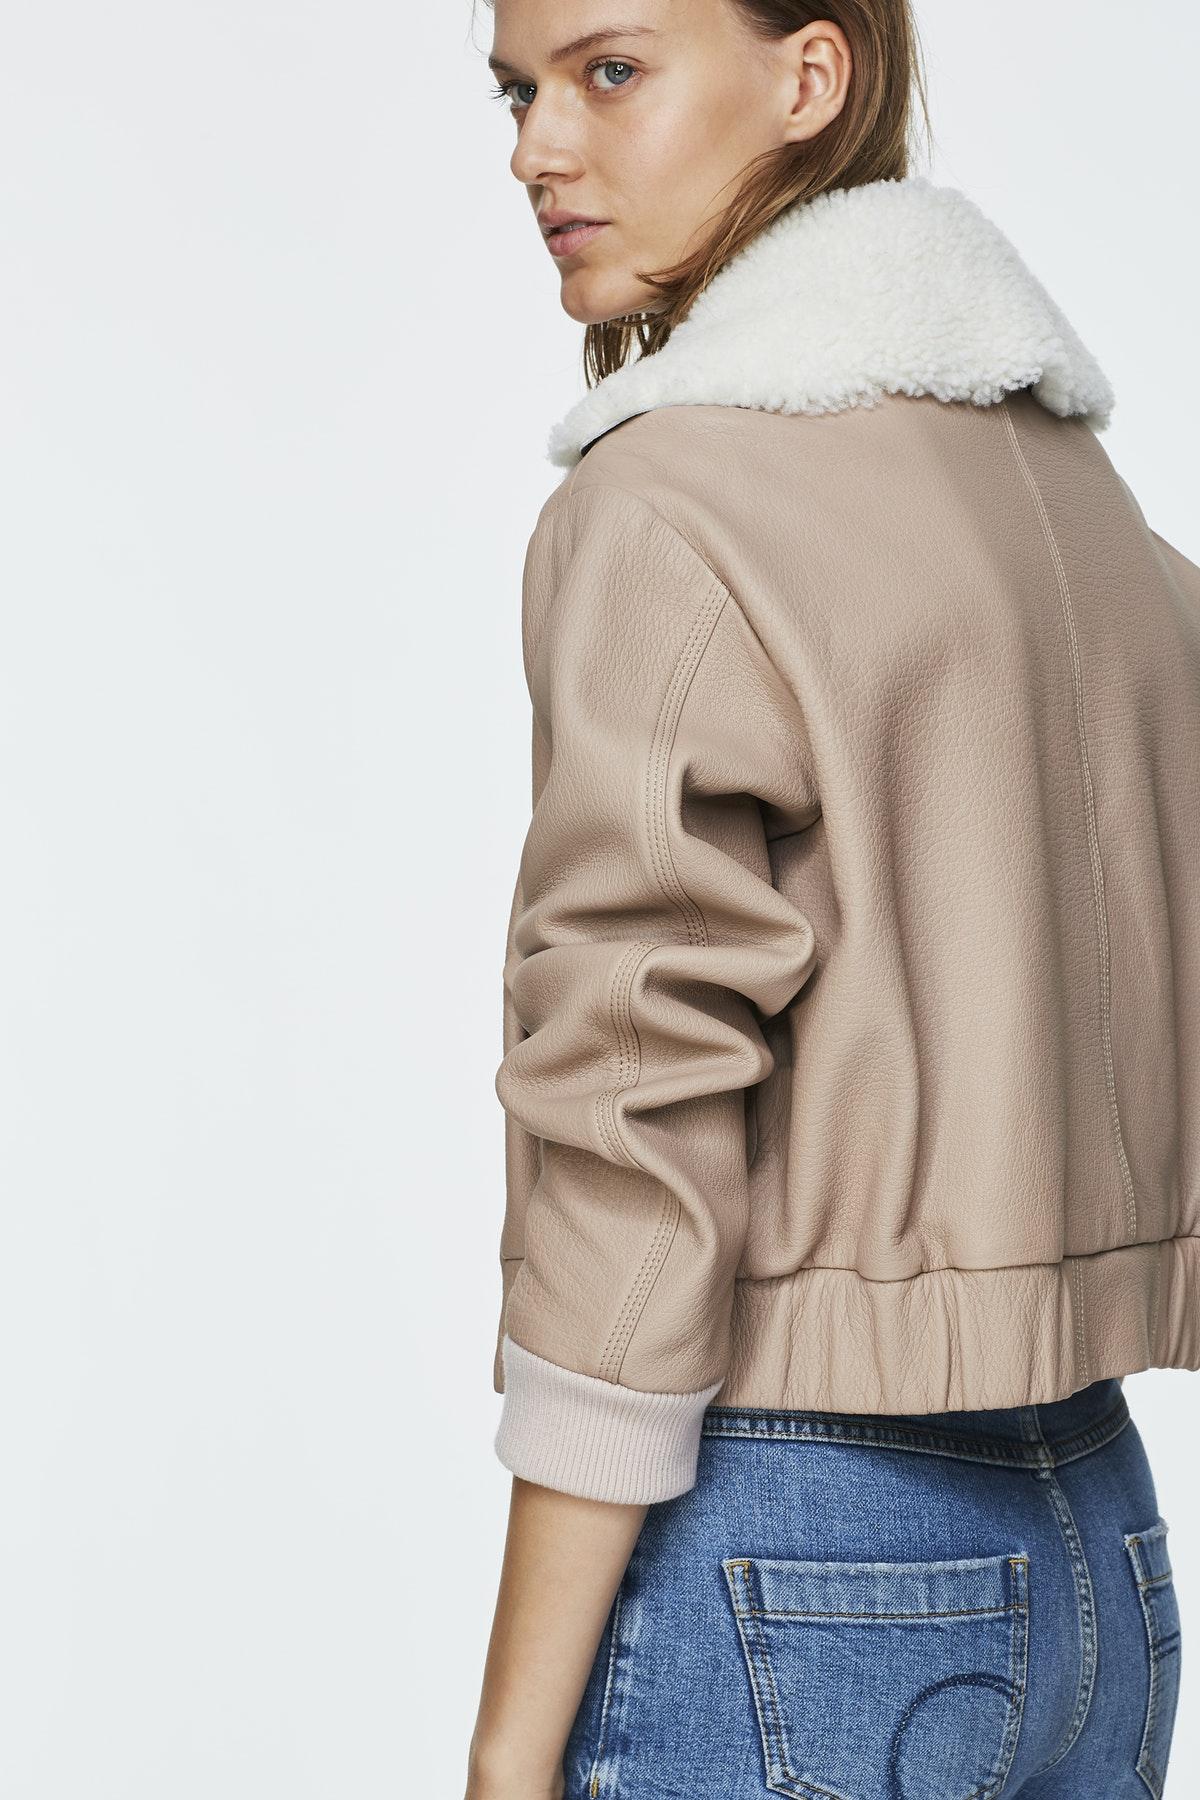 Girl in shearling jacket